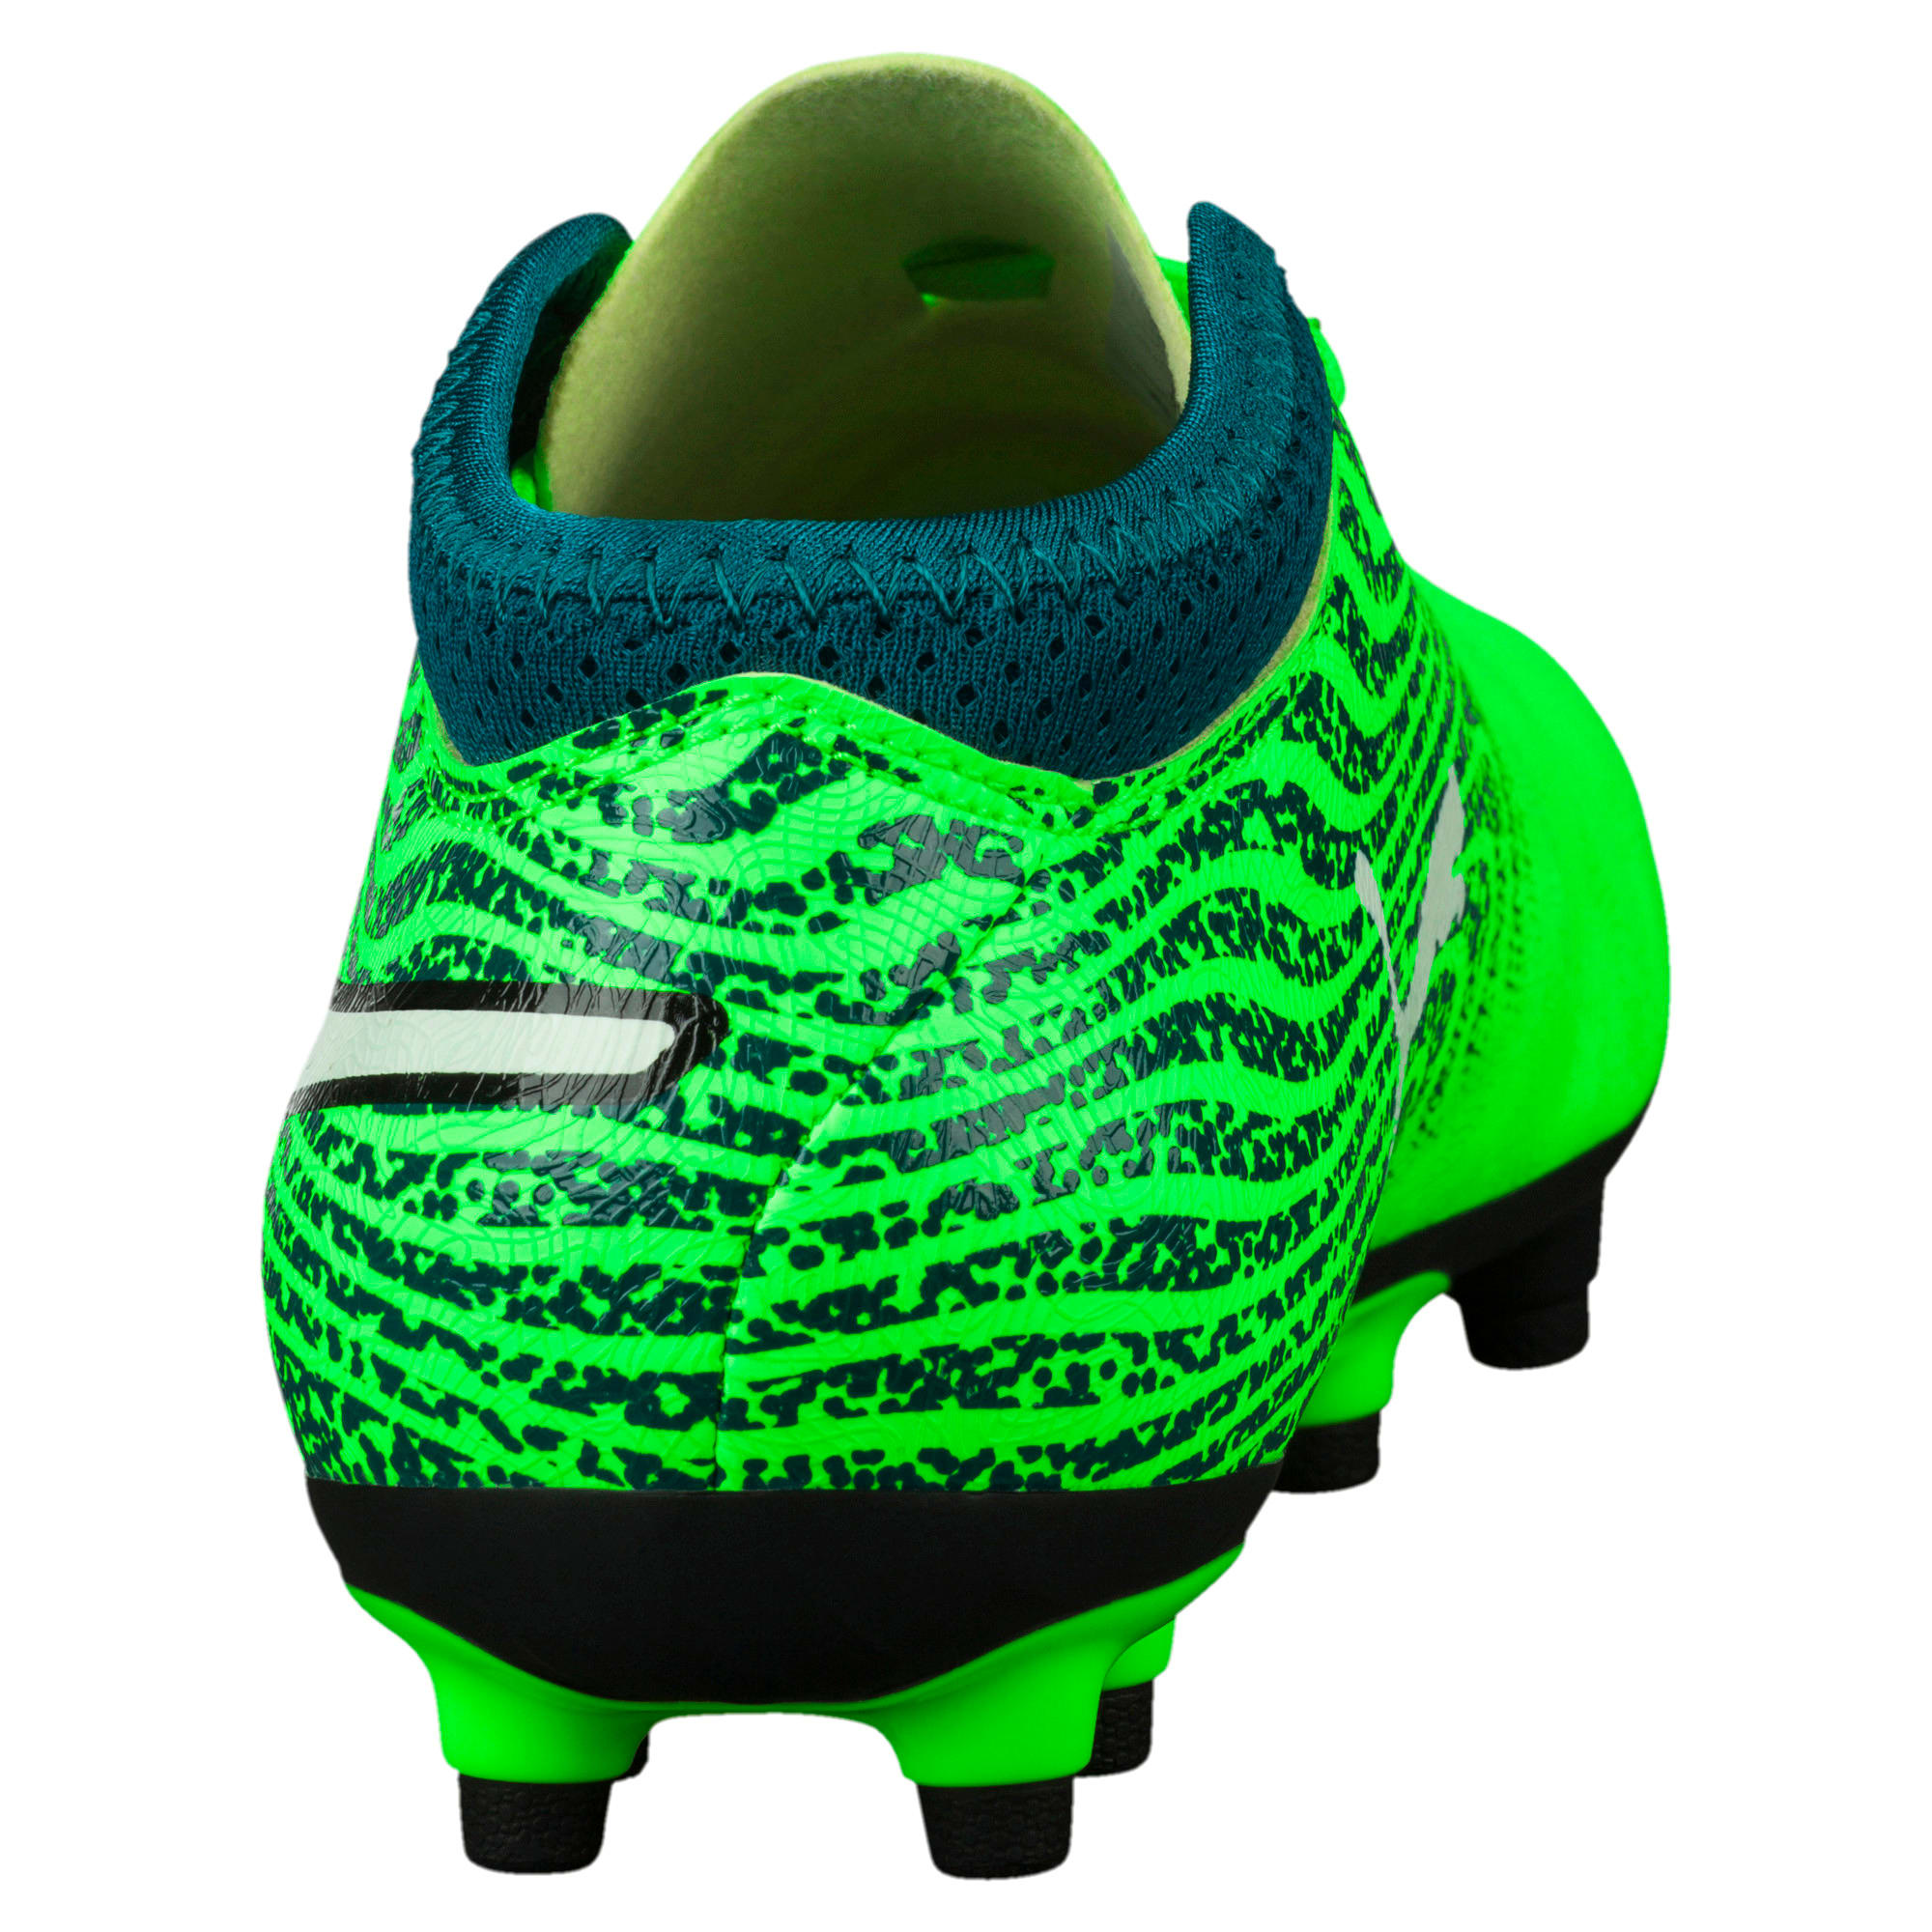 Thumbnail 4 of ONE 18.4 FG Kids' Football Boots, Green-White-Deep Lagoon, medium-IND